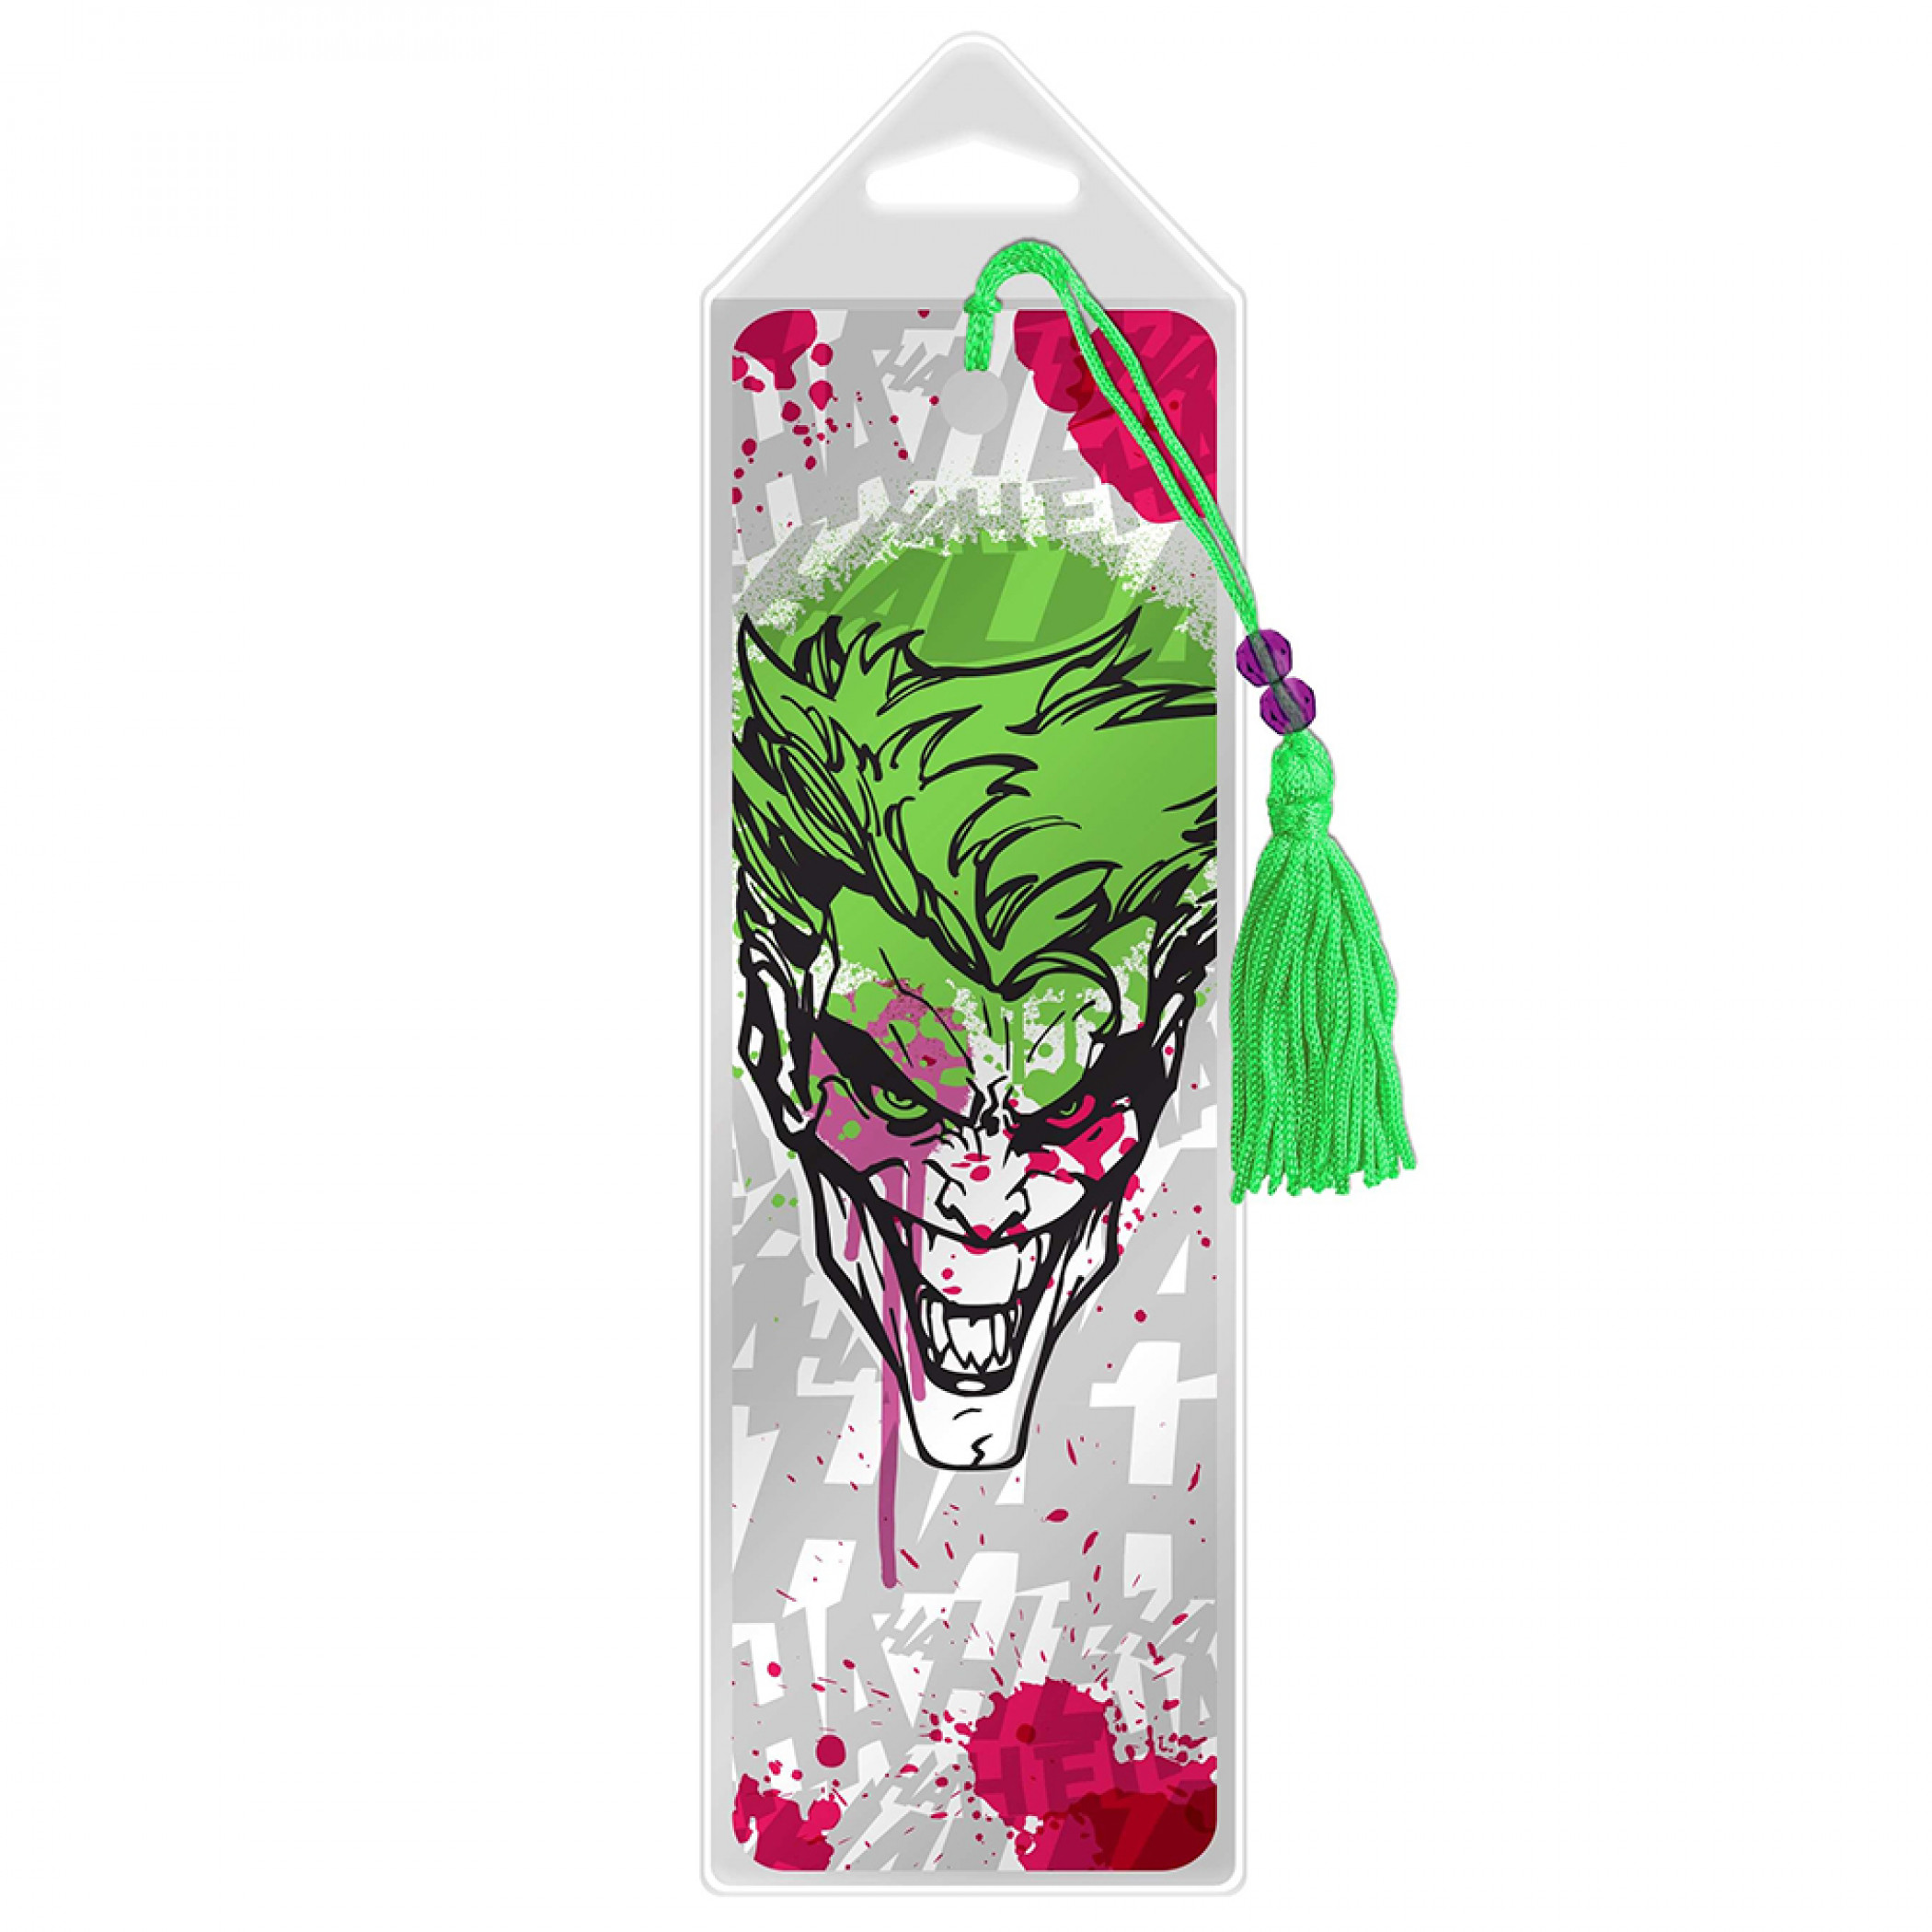 Joker Character Hahaha Graffiti Splatter Bookmark